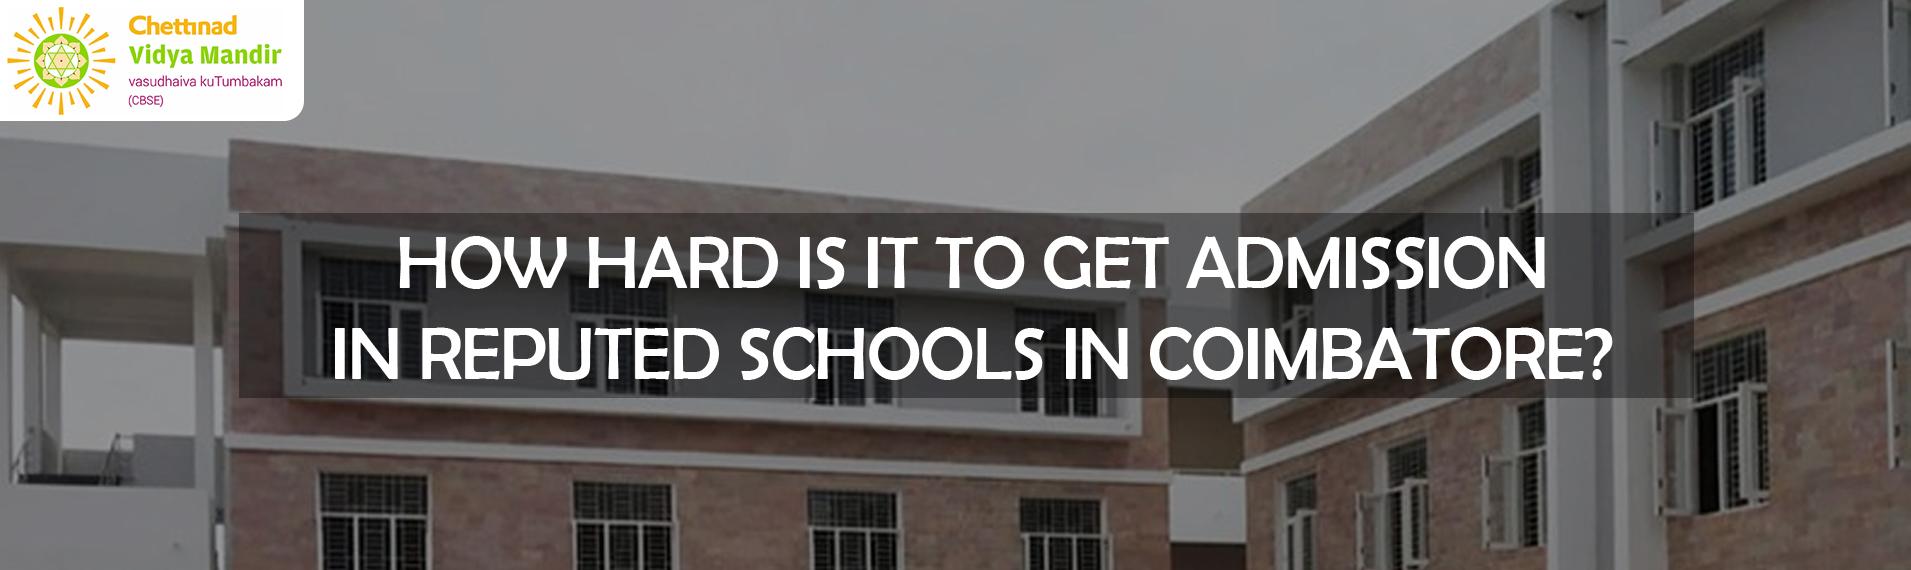 School Admission in Coimbatore